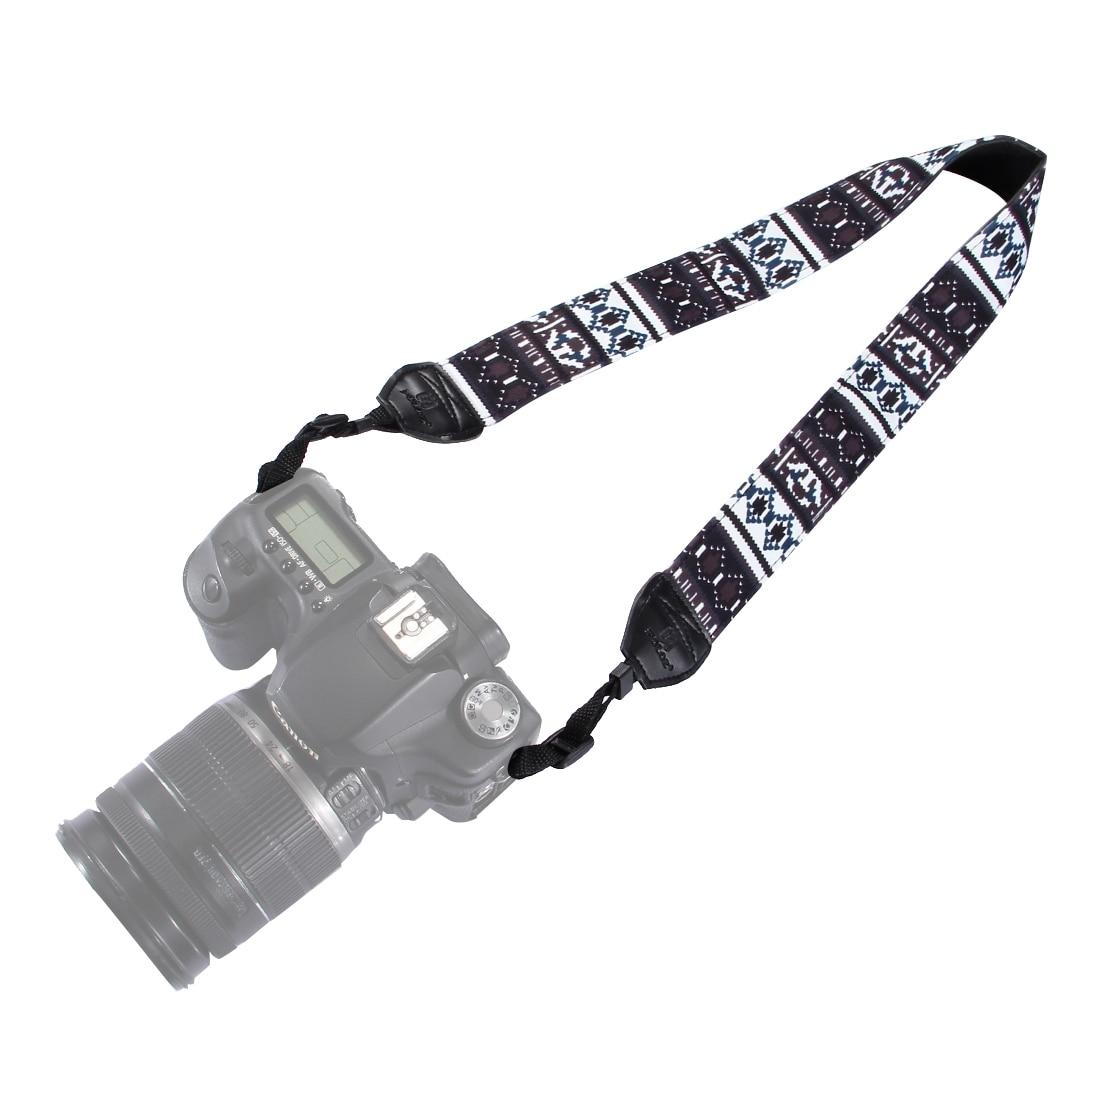 PULUZ PU6007A Retro Ethnic Style Multi-color Series Shoulder Neck Strap Camera Strap for SLR DSLR Camera Photography Accessories